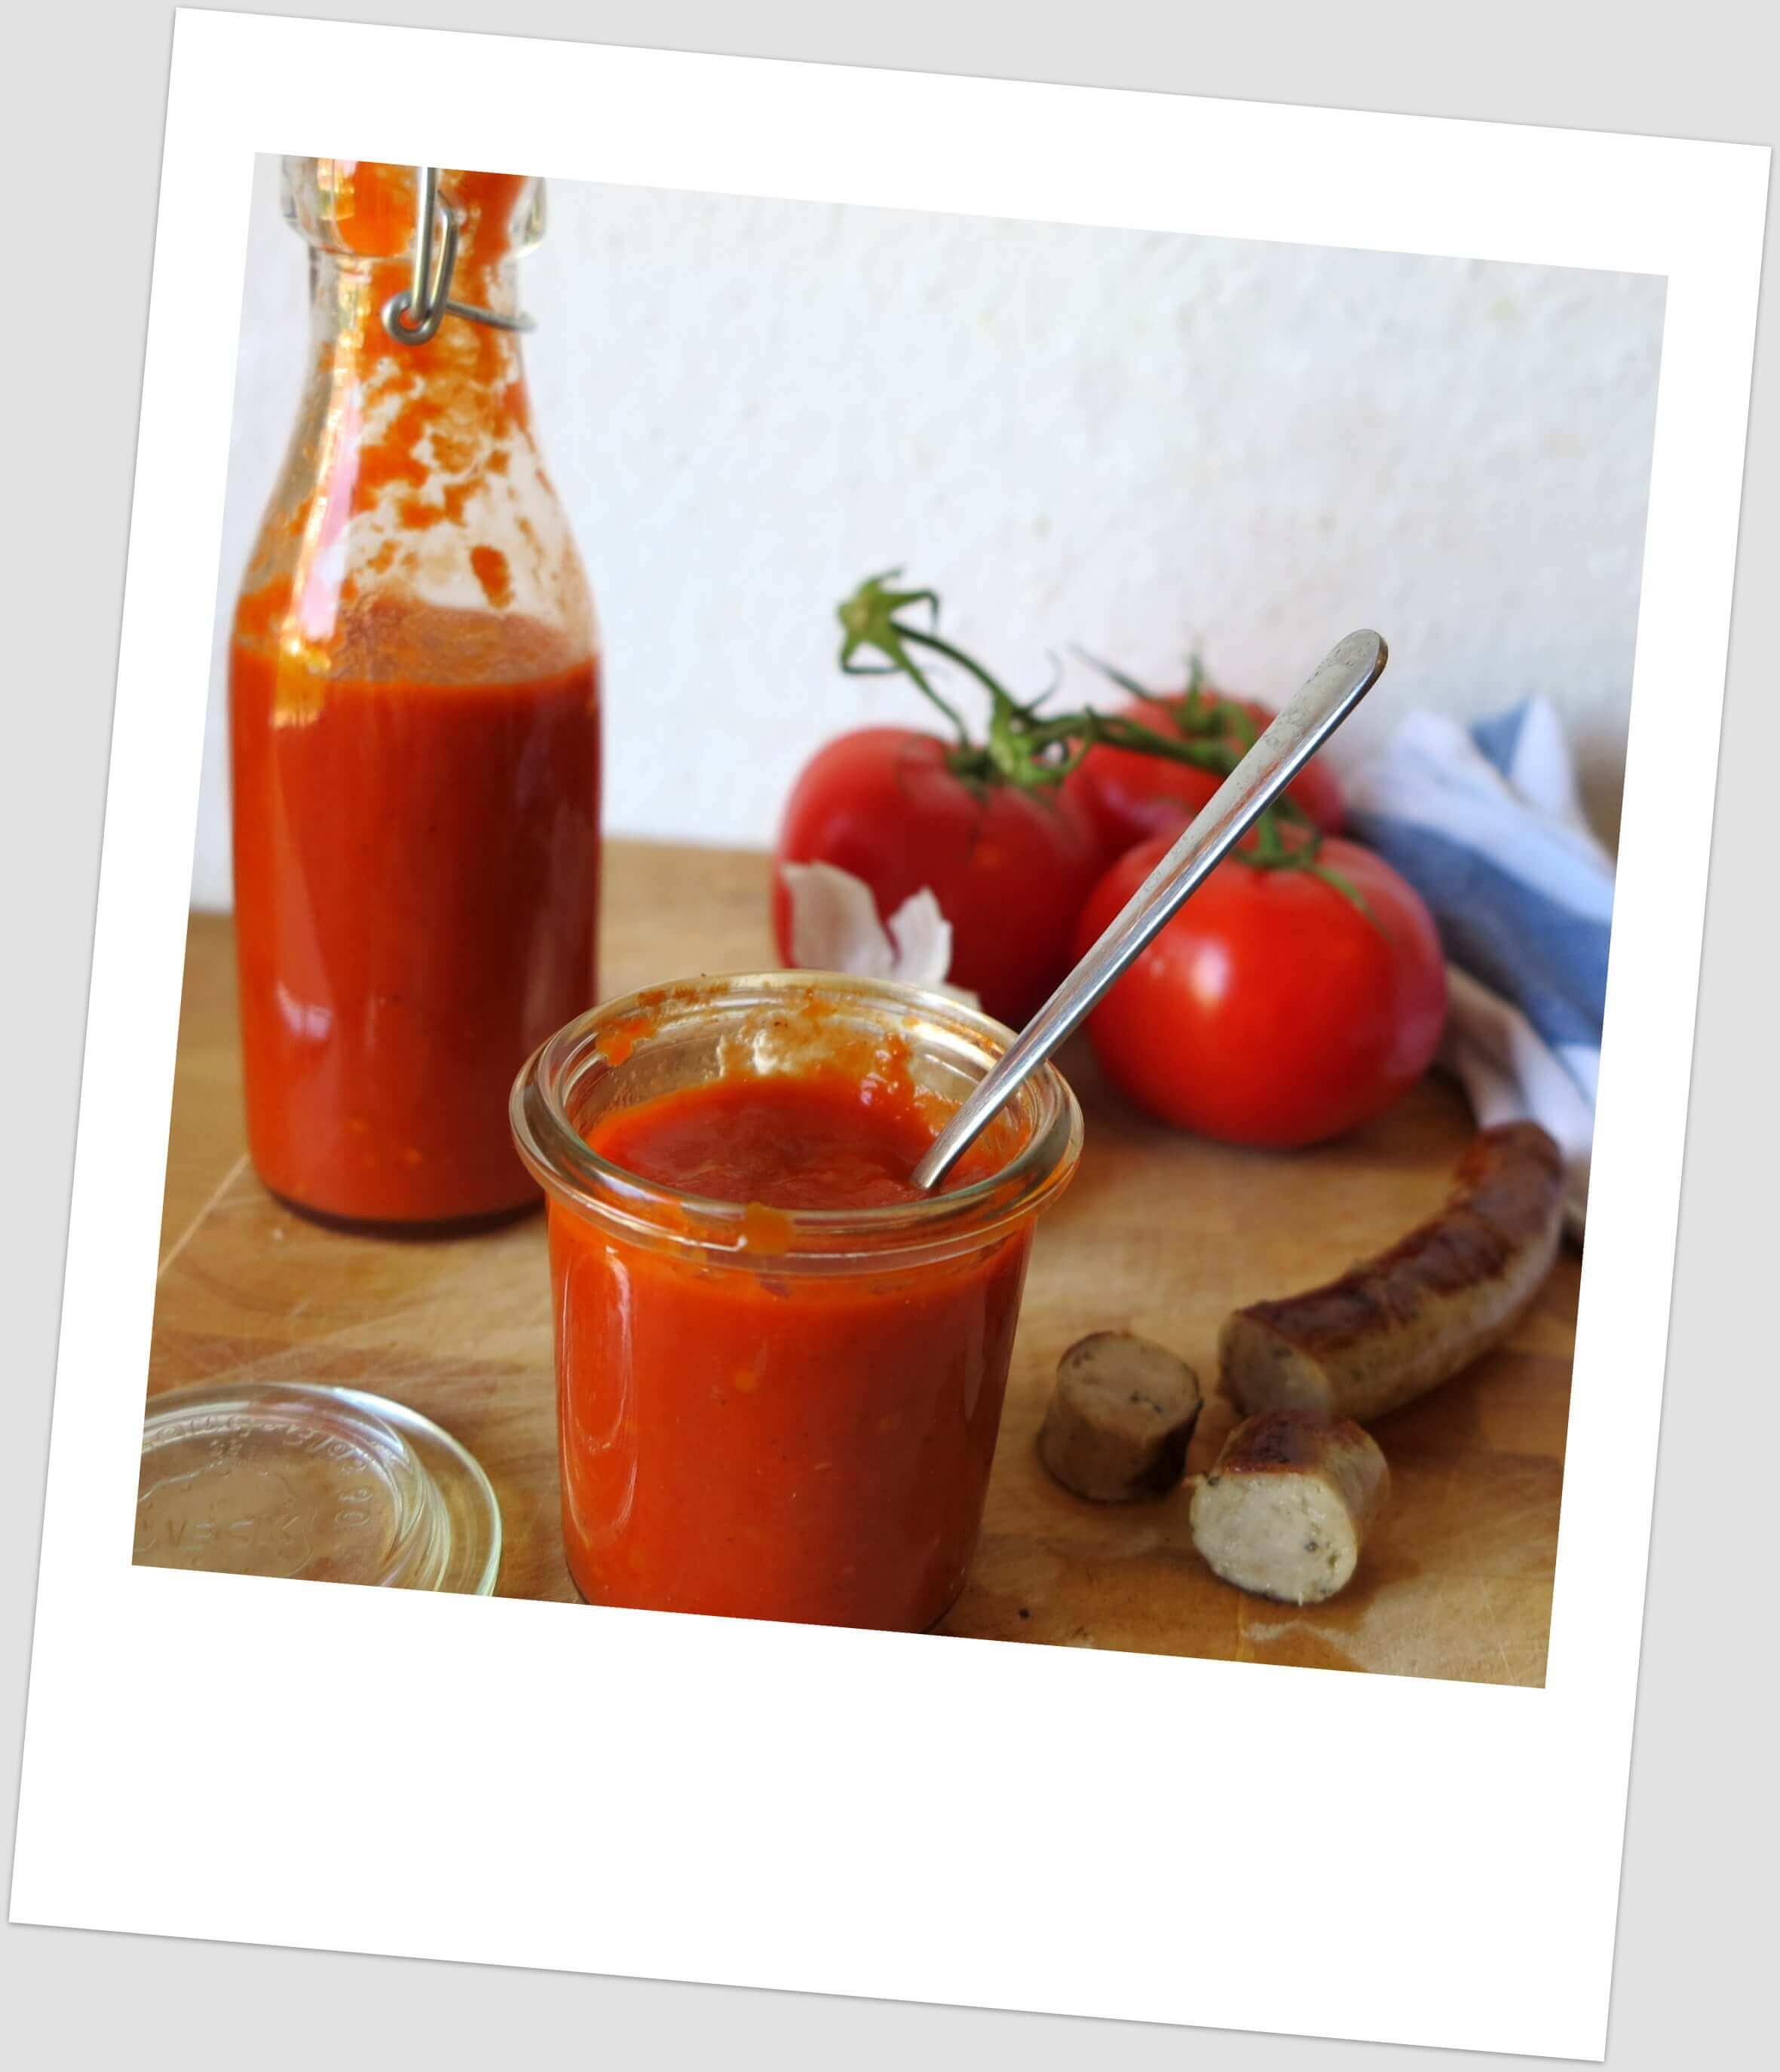 low carb ketchup no sugar twinfit. Black Bedroom Furniture Sets. Home Design Ideas